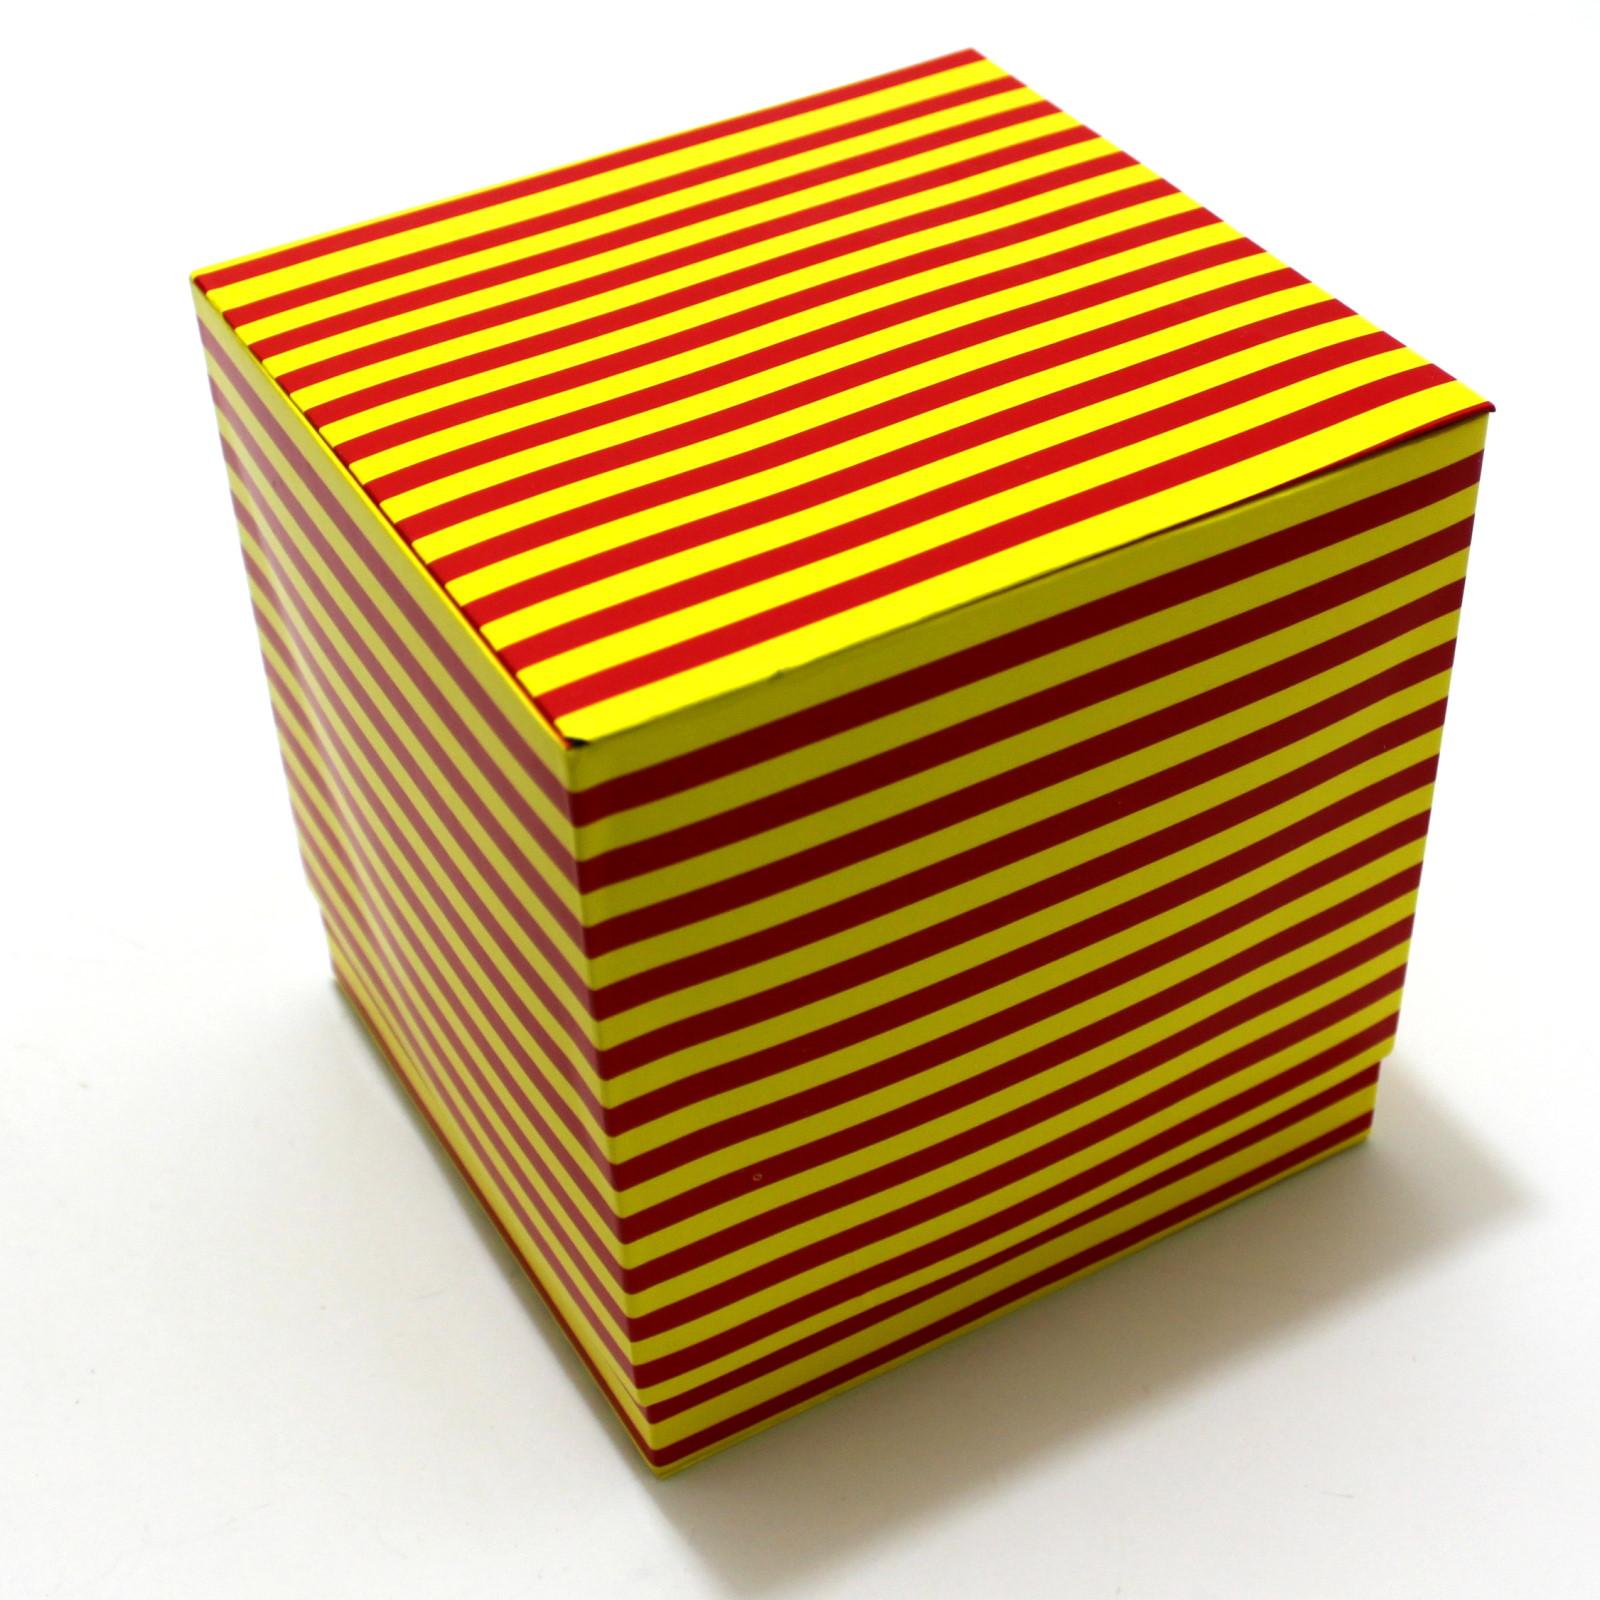 Lubor's Gift by Paul Harris